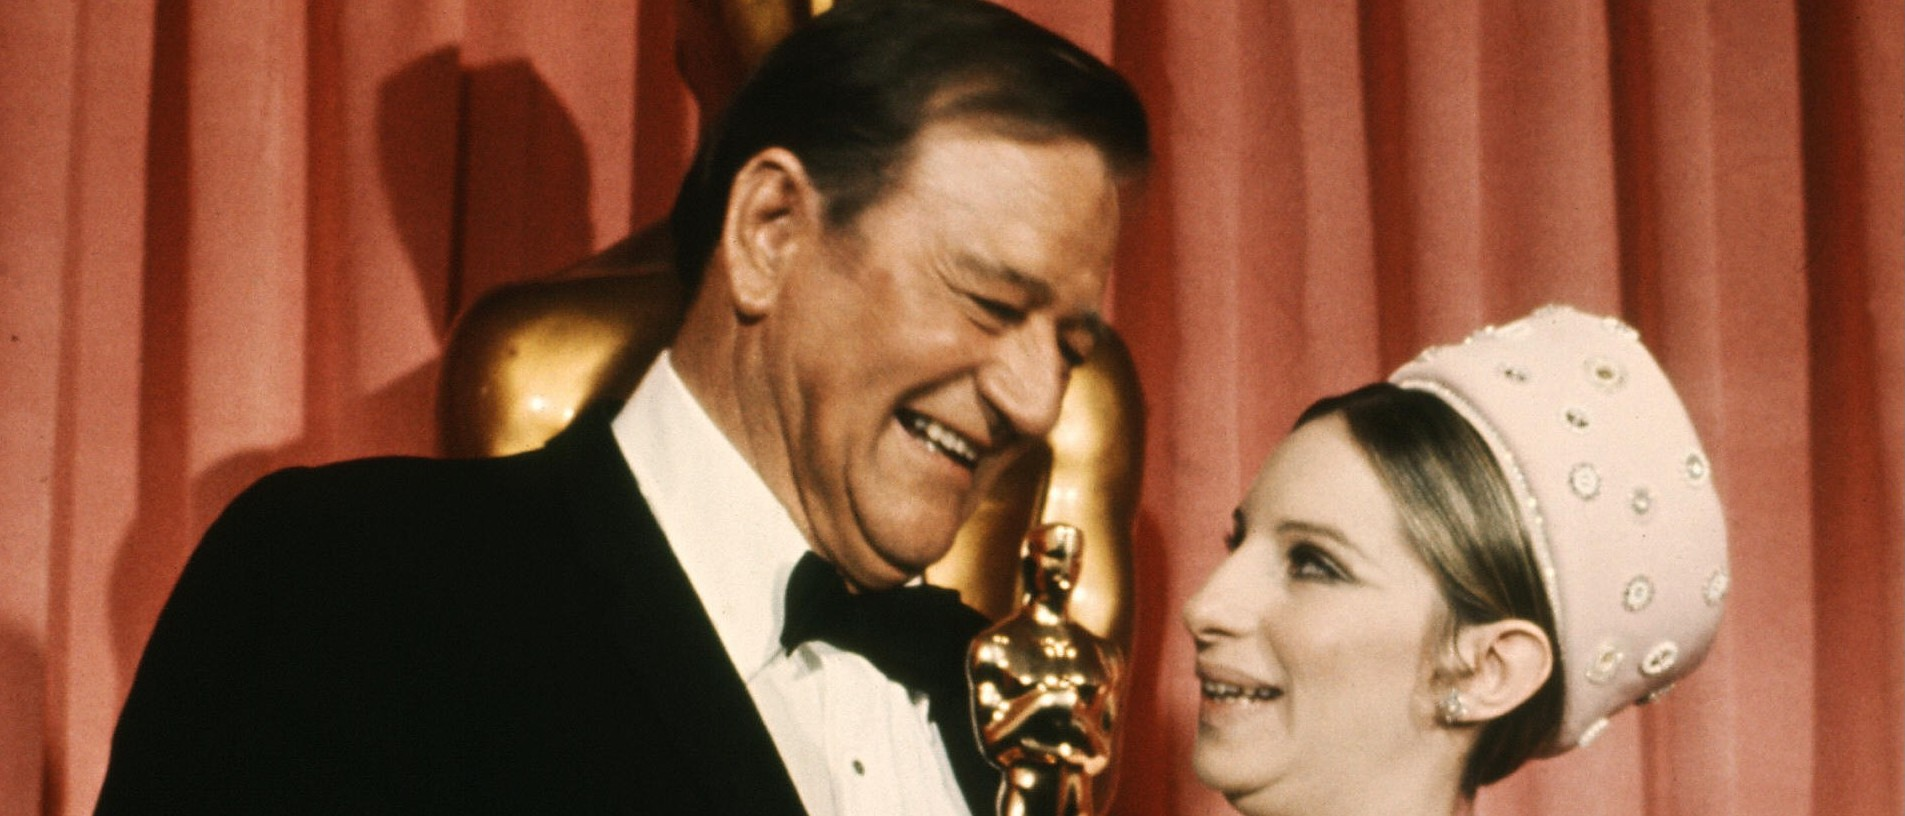 US actor John Wayne